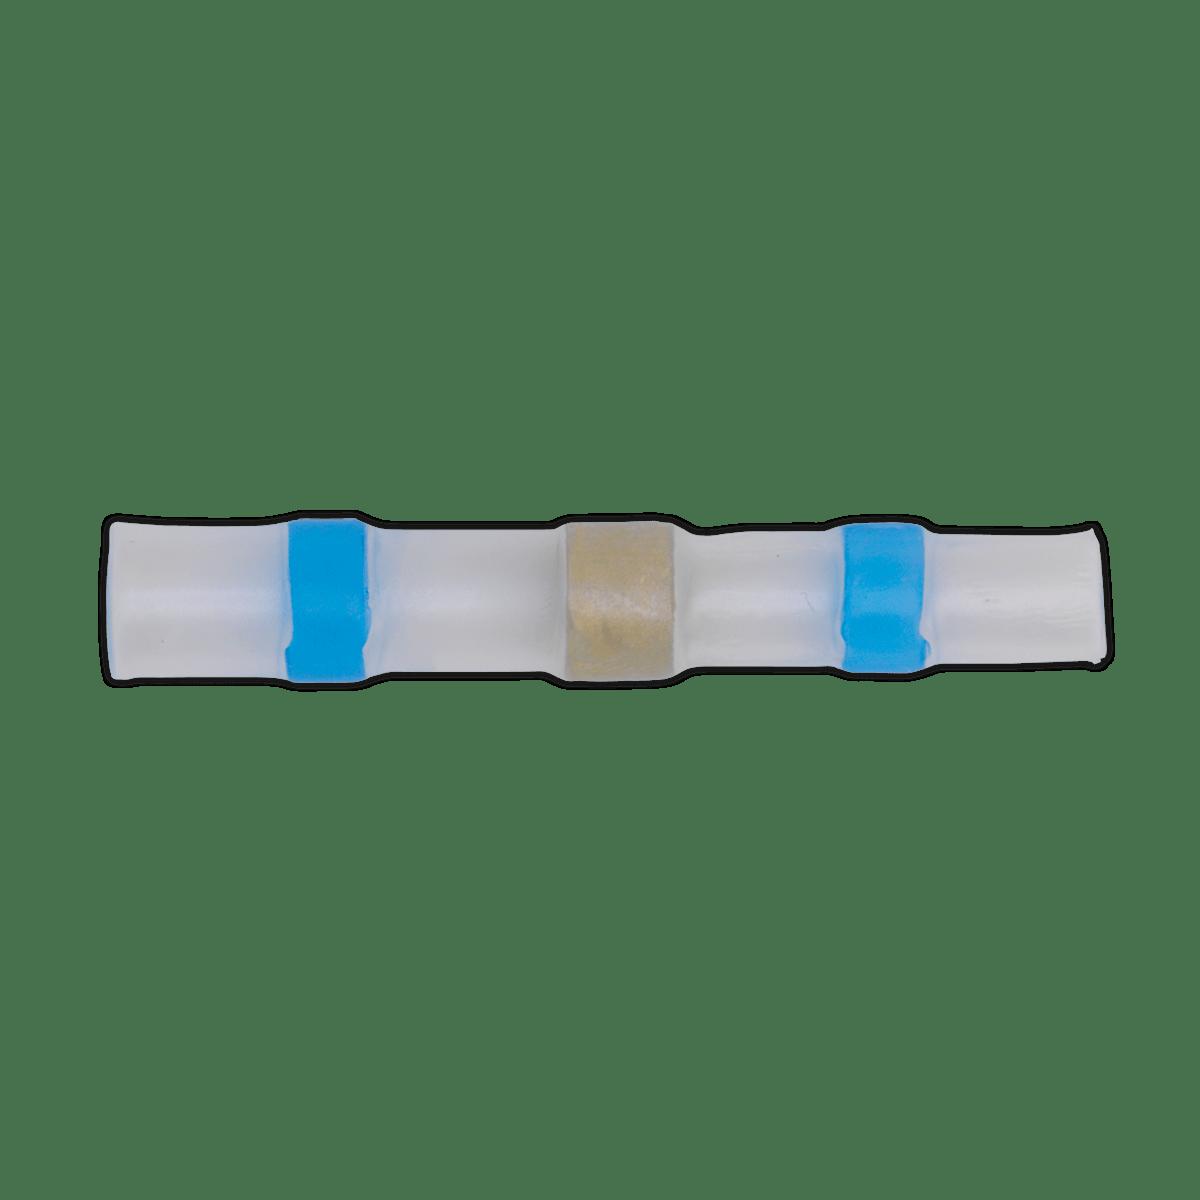 Sealey Heat Shrink Butt Connector Solder Terminal 16-14 AWG Blue Pa BTSSB25